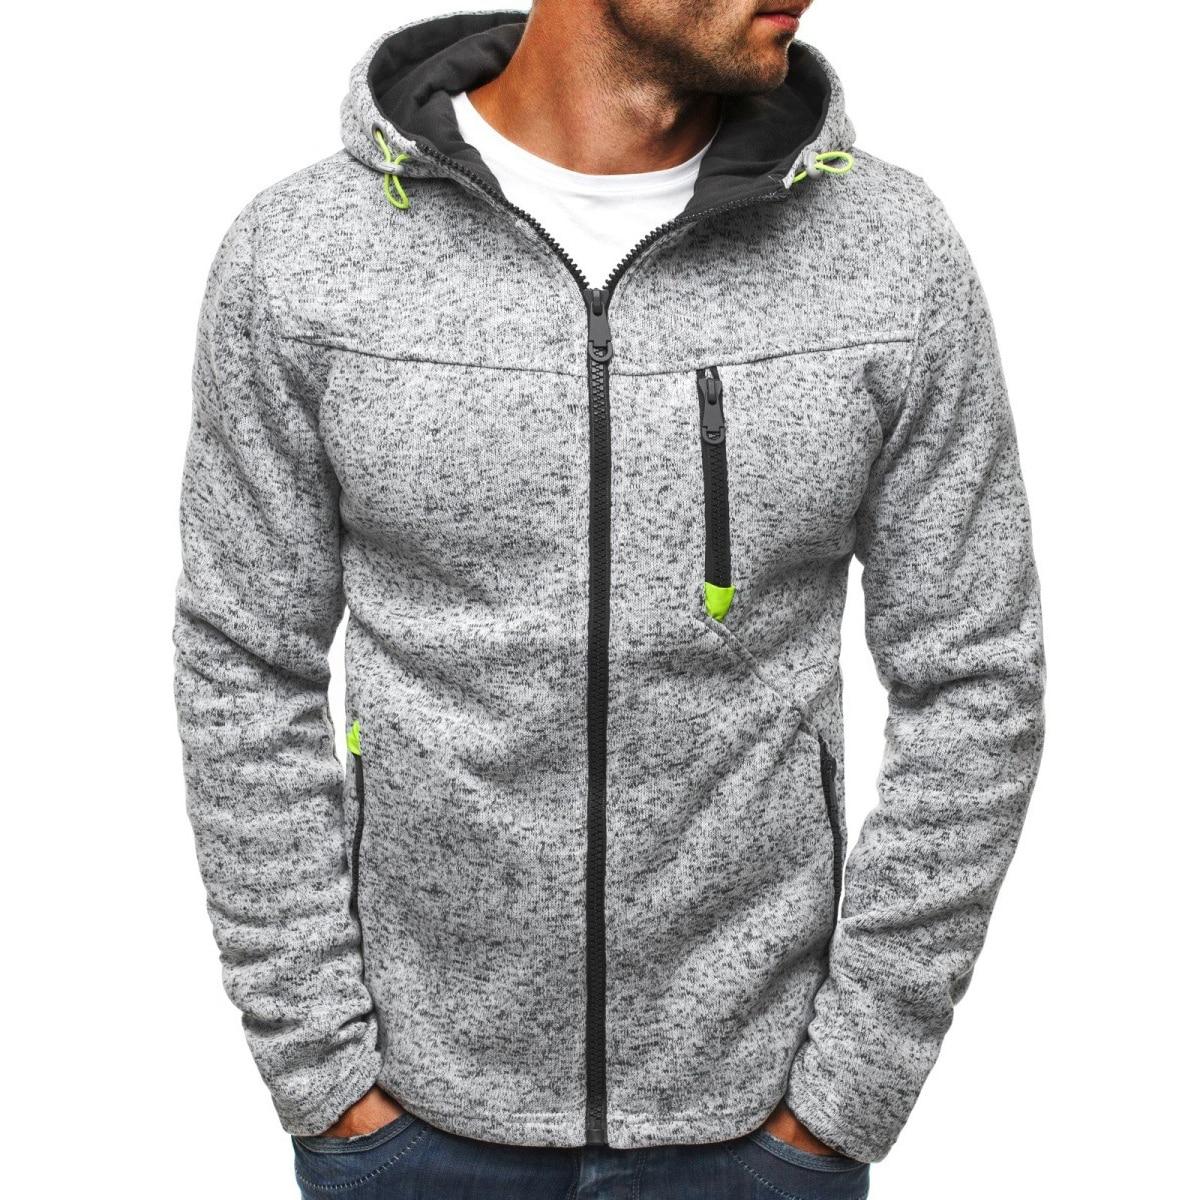 MRMT 2021 Brand Jacquard Hoodie Fleece Cardigan Hooded Coat Men's Hoodies Sweatshirts Pullover For M